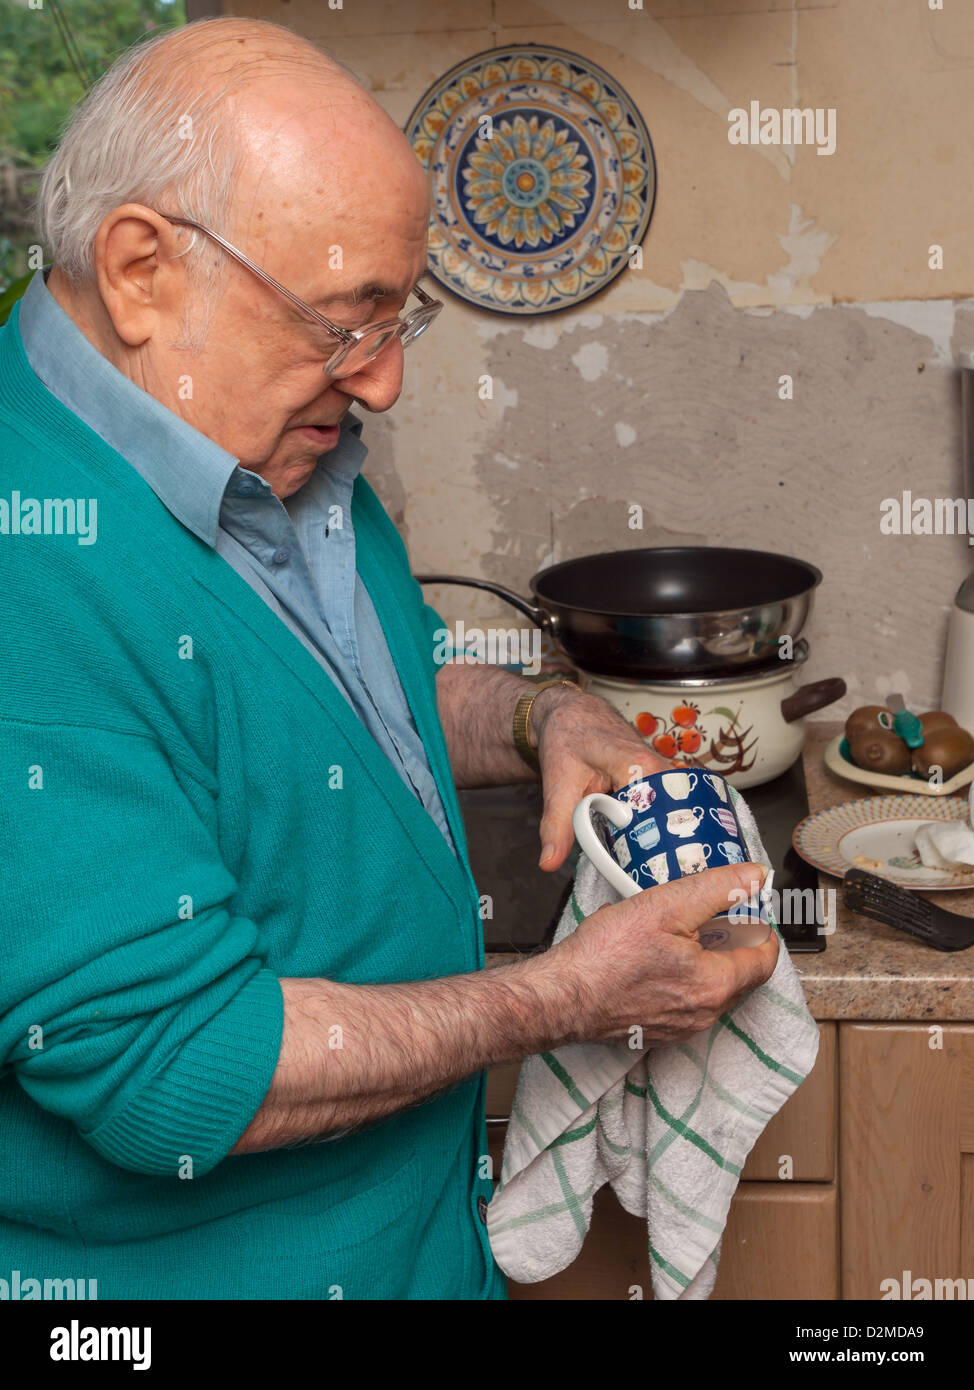 90s Kitchen Stock Photos & 90s Kitchen Stock Images - Alamy